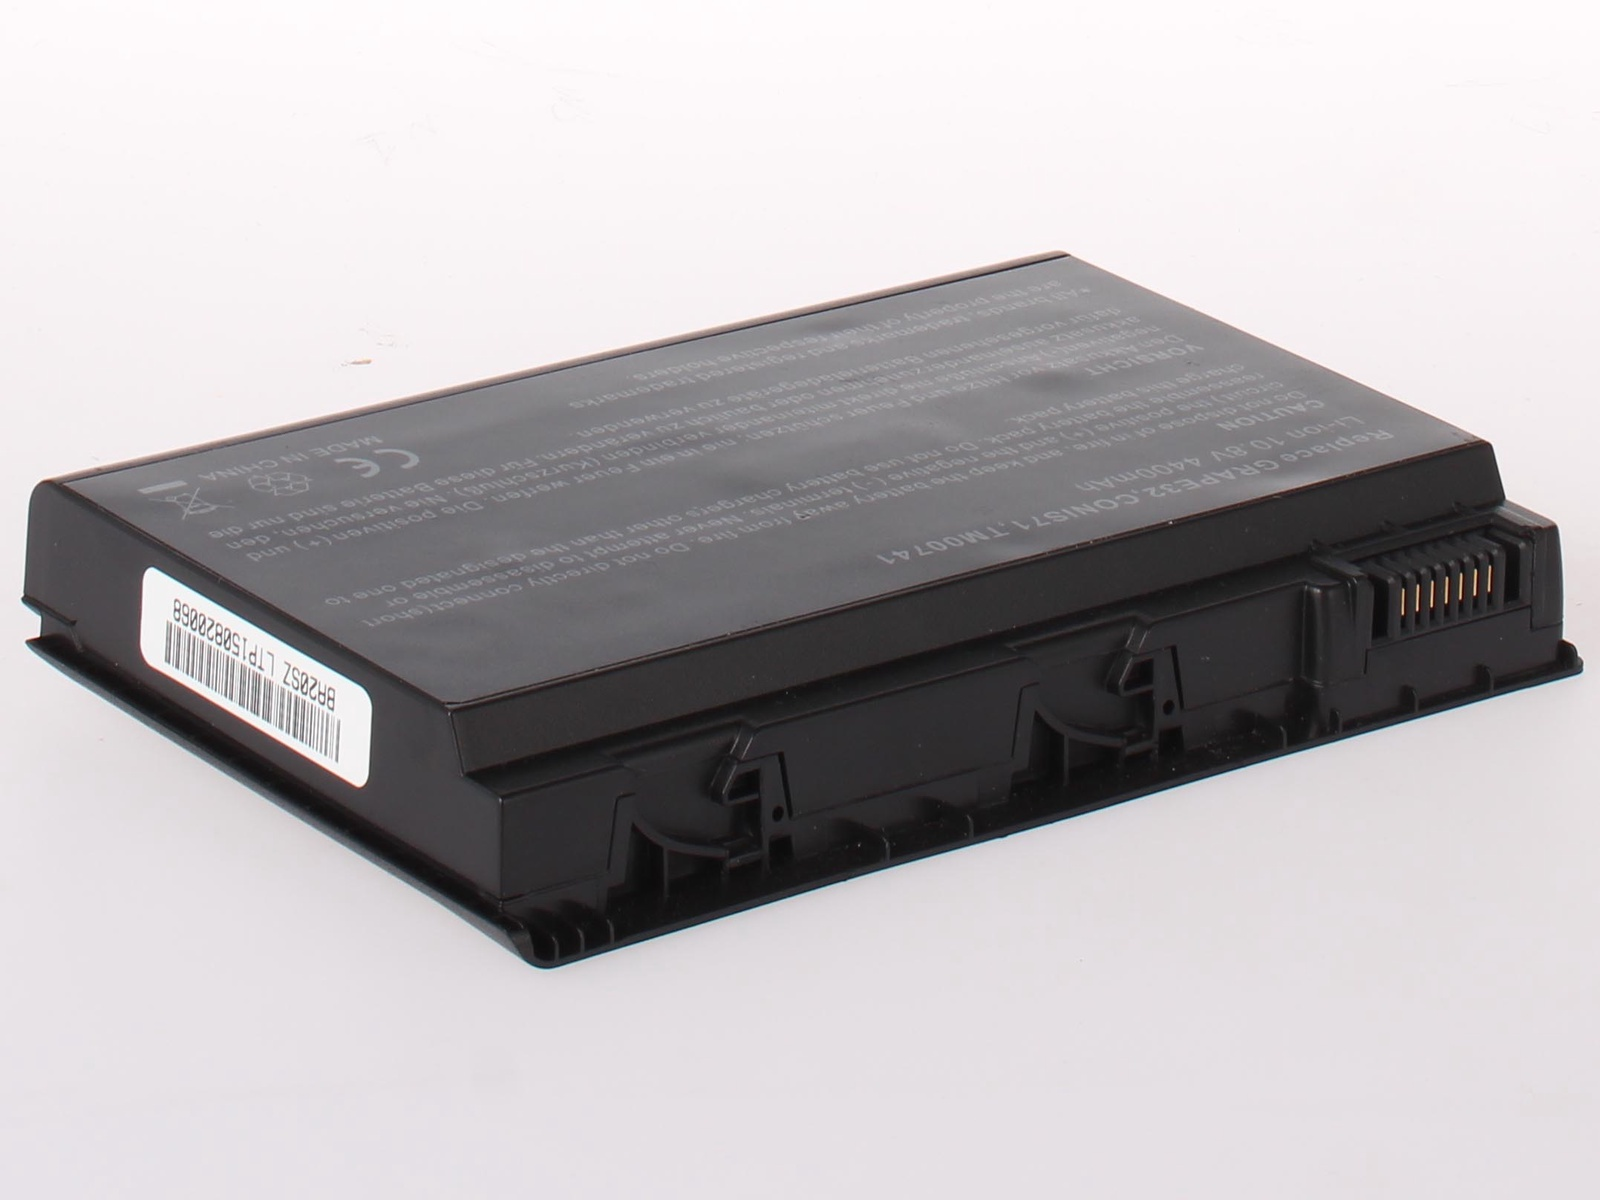 Аккумулятор для ноутбука AnyBatt для Acer Extensa 5610, TravelMate 5720G, Extensa 7620, Travelmate 6592, Extensa 5230E, Extensa 5230, Extensa 5200, TravelMate 5520, Extensa 5630Z, TravelMate 5730, TravelMate 5520G, Extensa 5510 цены